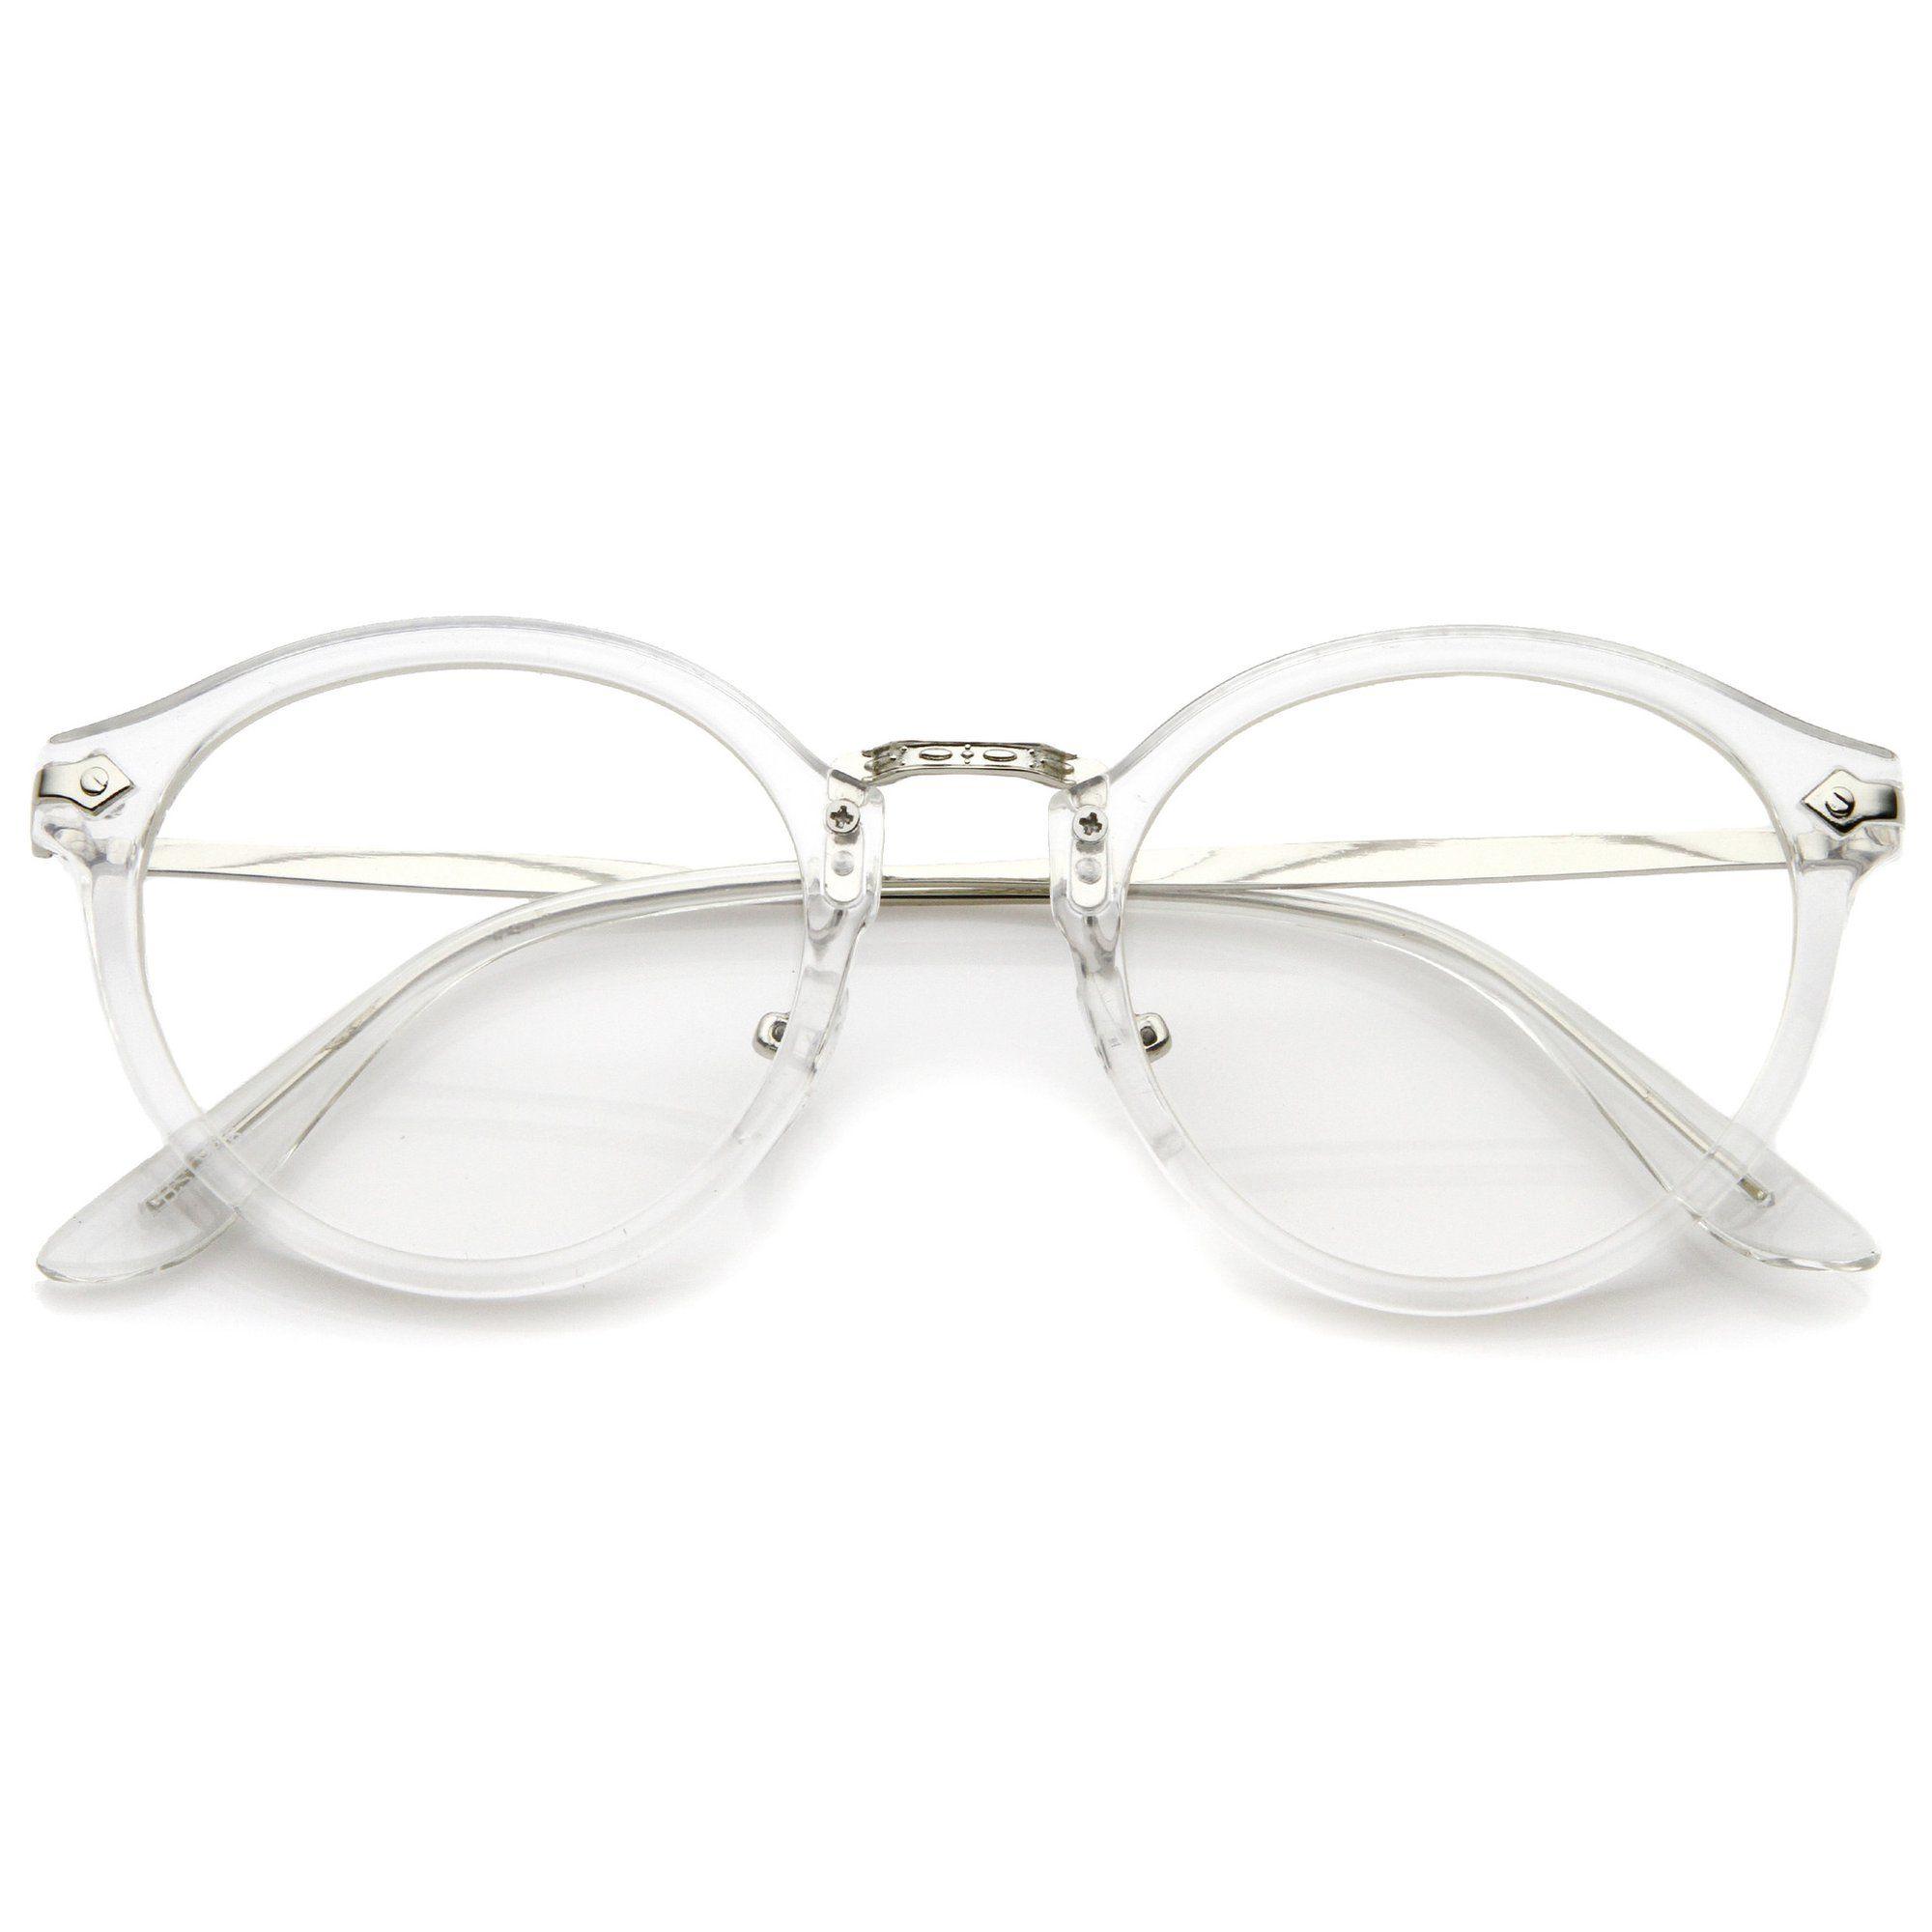 df4ebdd8a02f Ornate Engraved Vintage Dapper Clear Lens Glasses A844